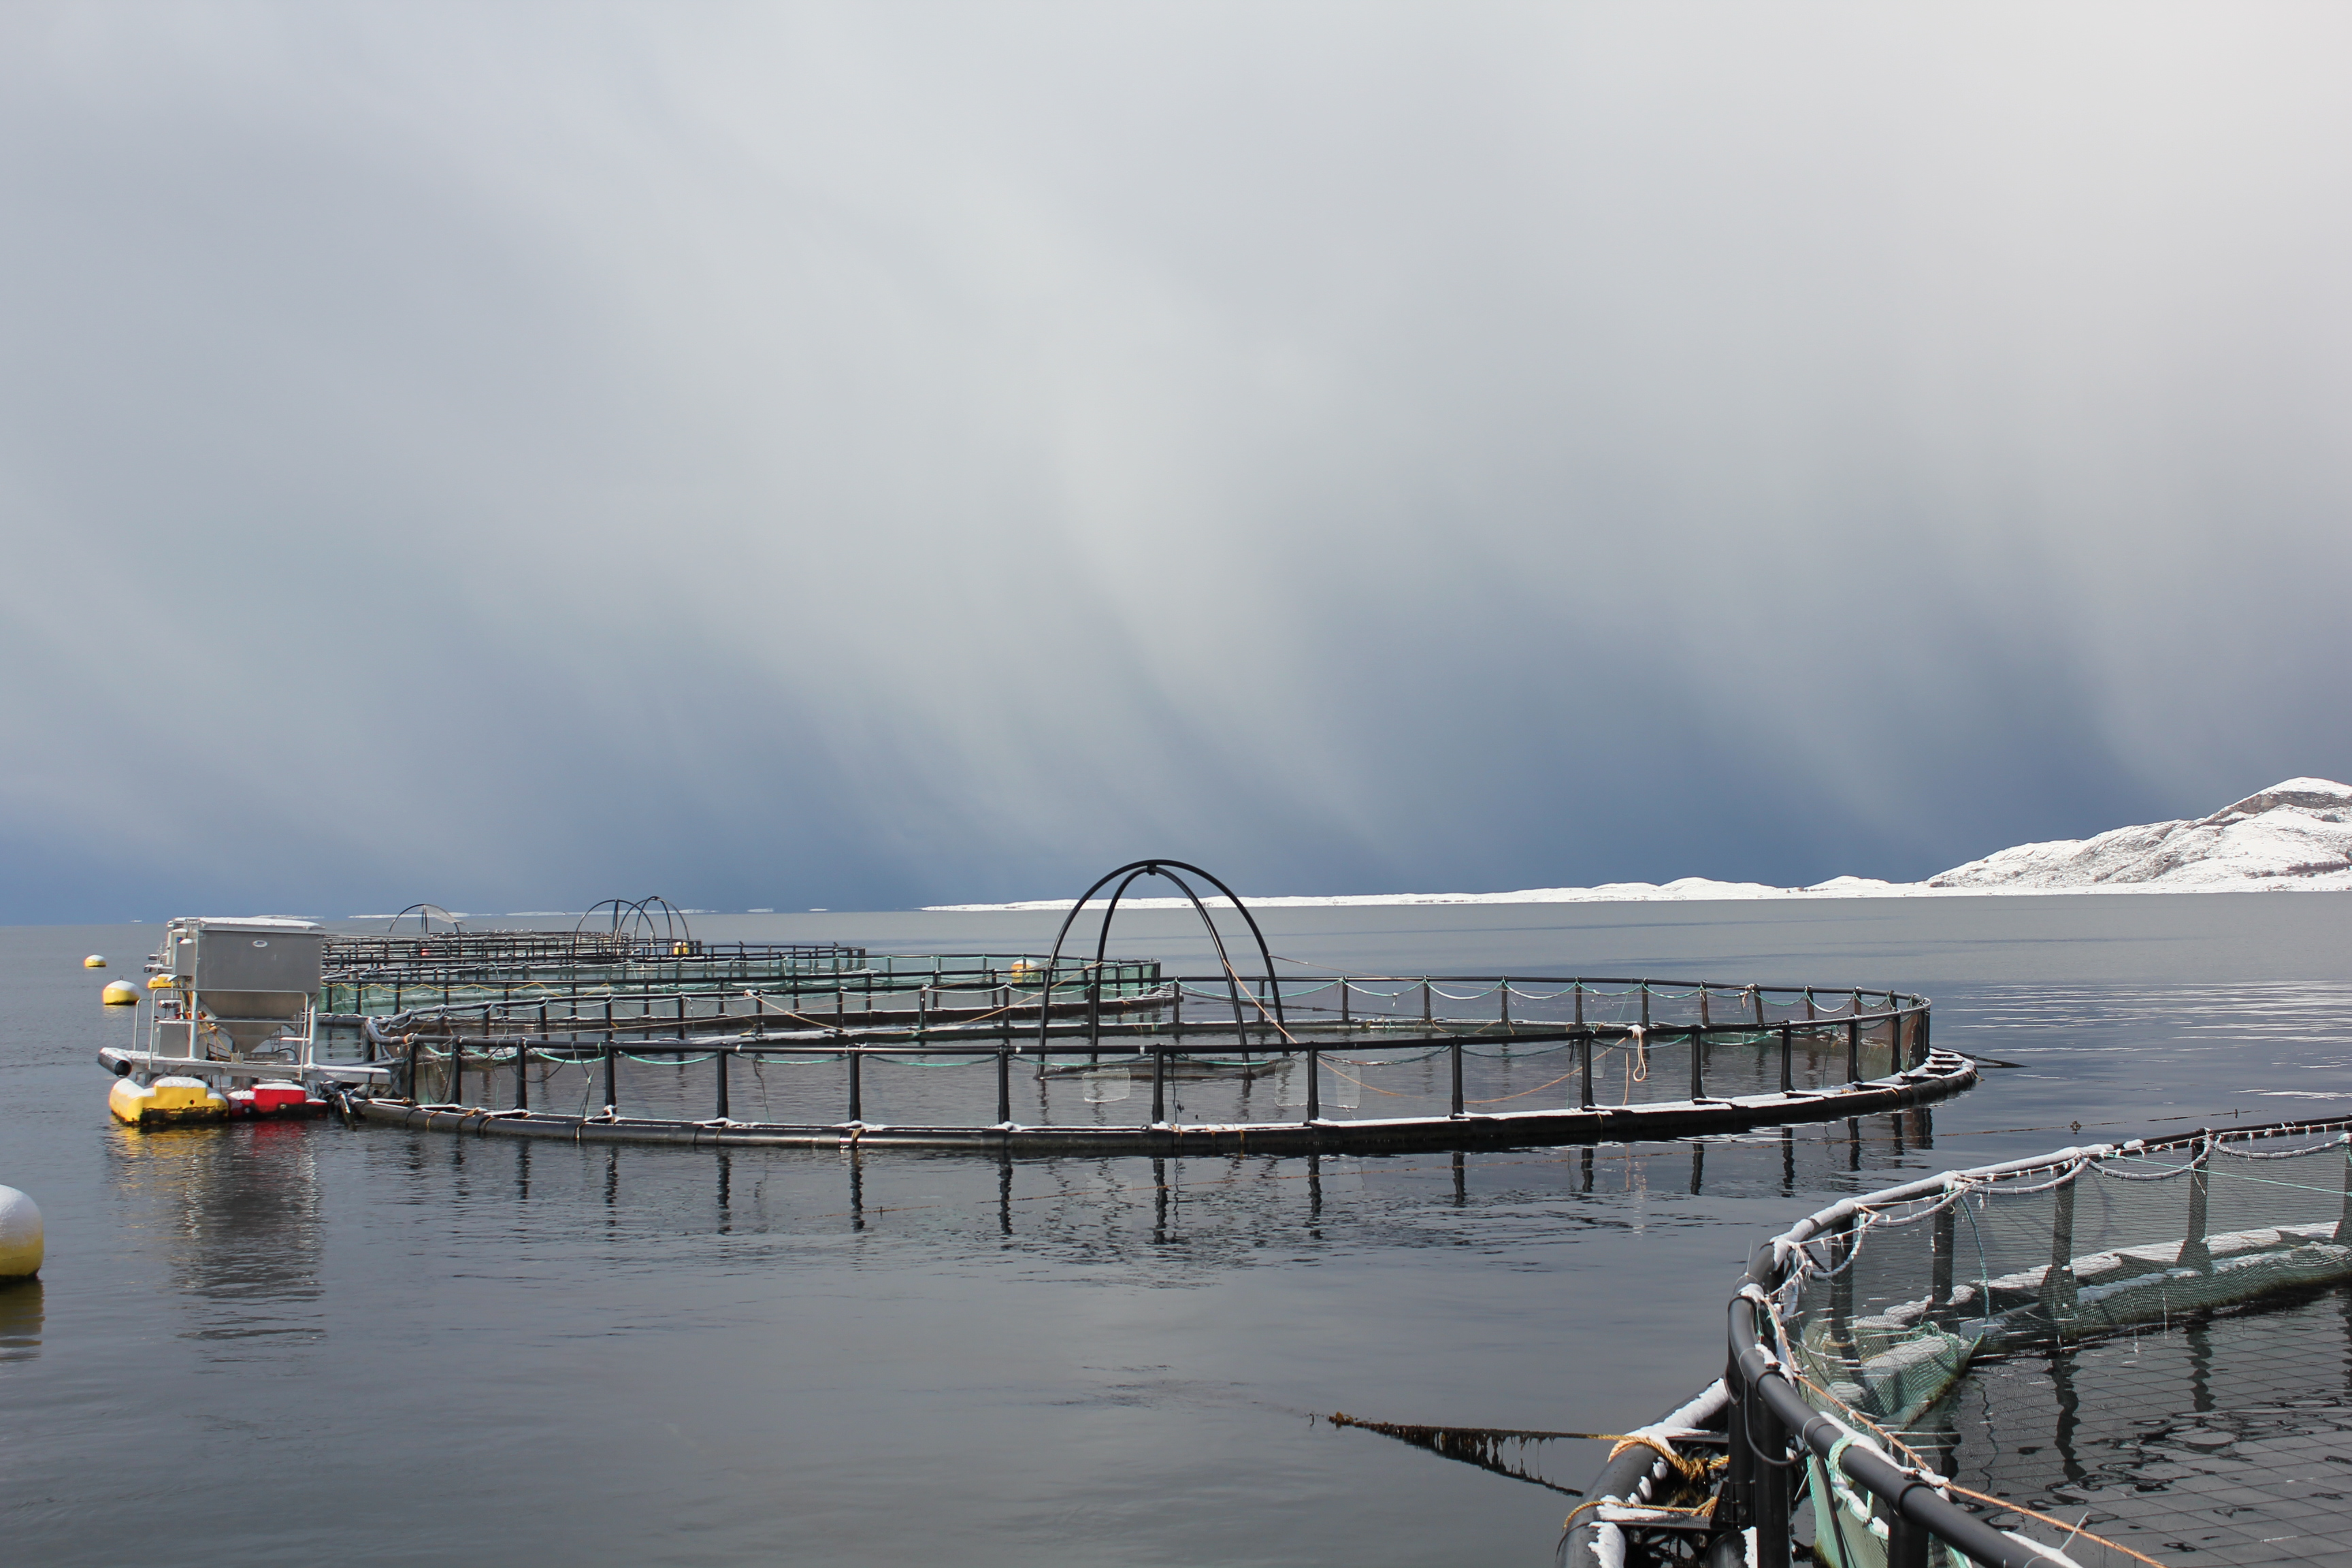 Kvarøy Fiskeoppdrett, Salmon Farm, Norway